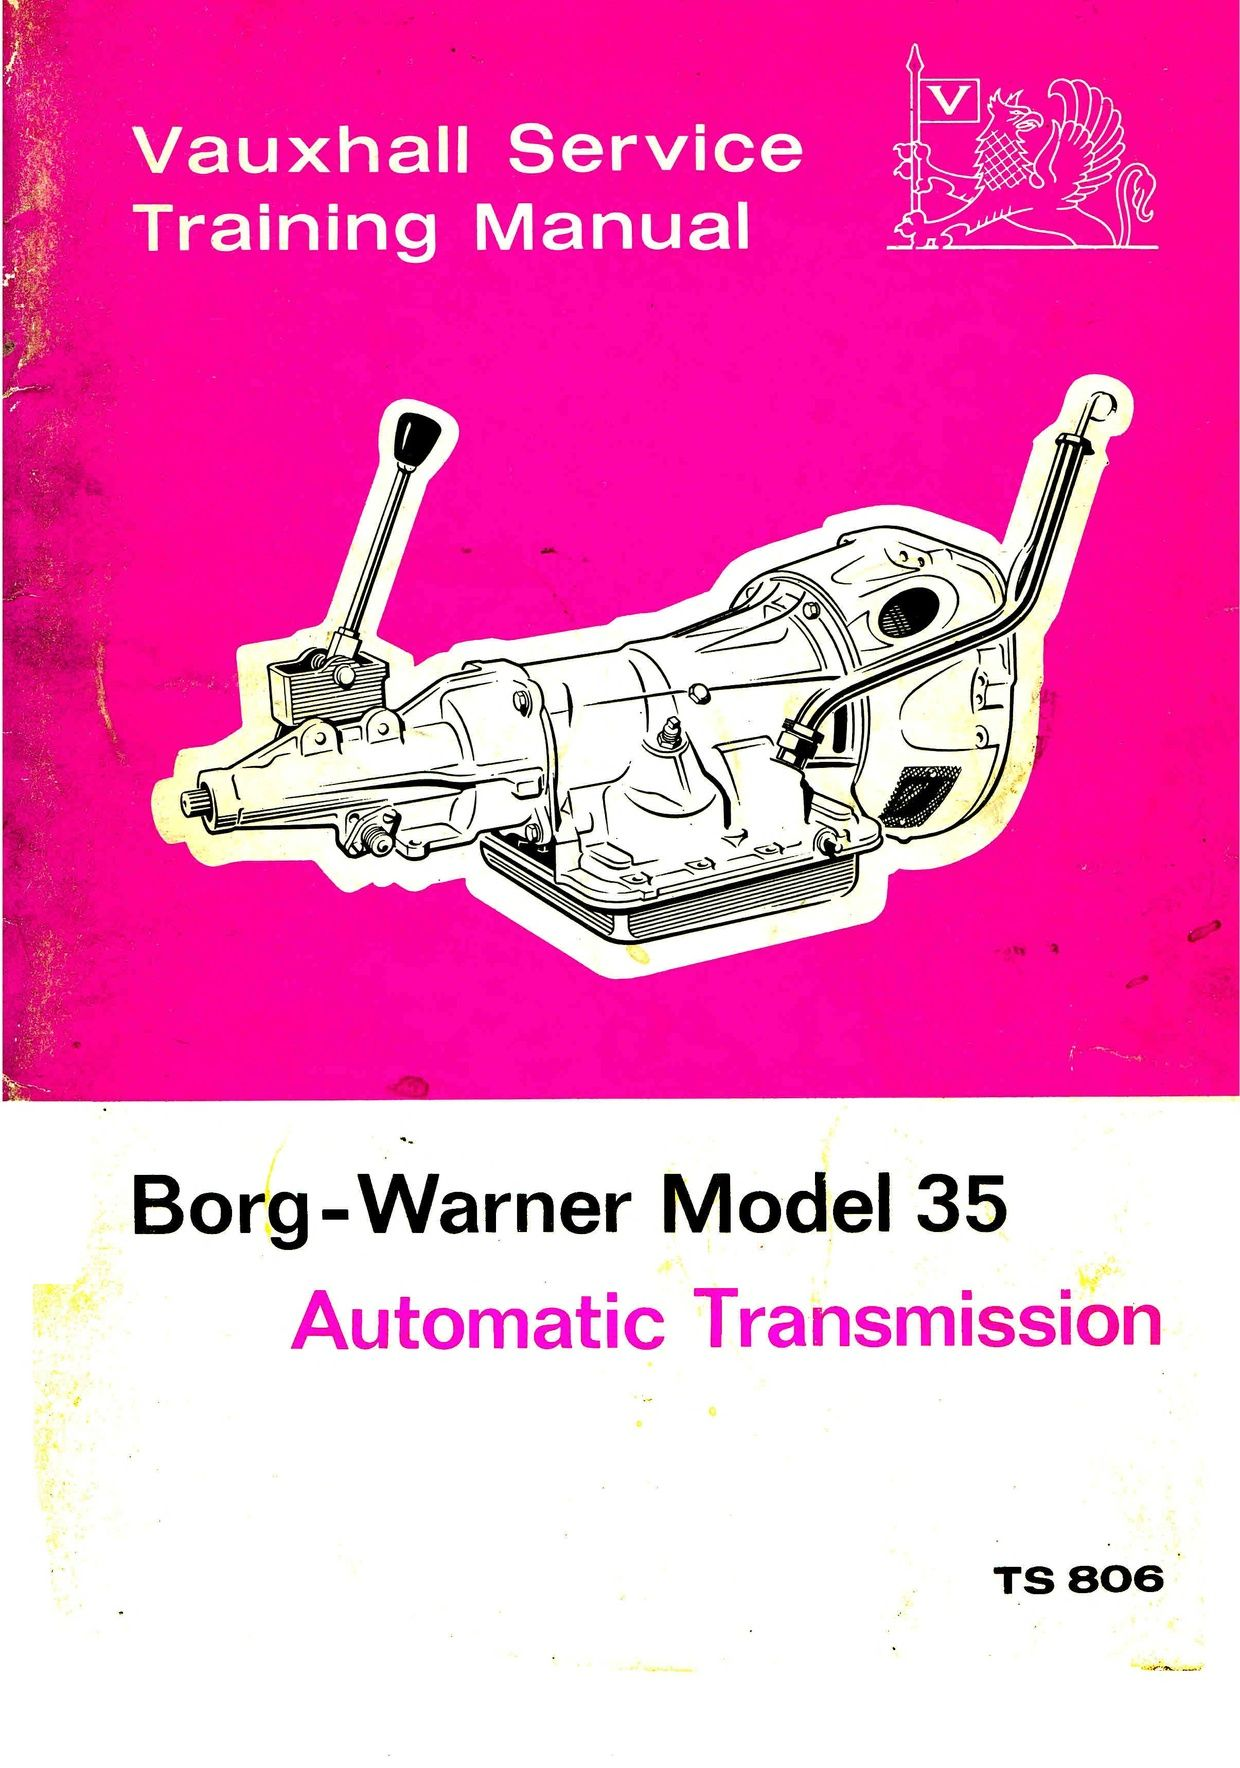 Gm Vauxhall Leycock Borg Warner Gear Box Manuals Vauxhall Train Book Borg